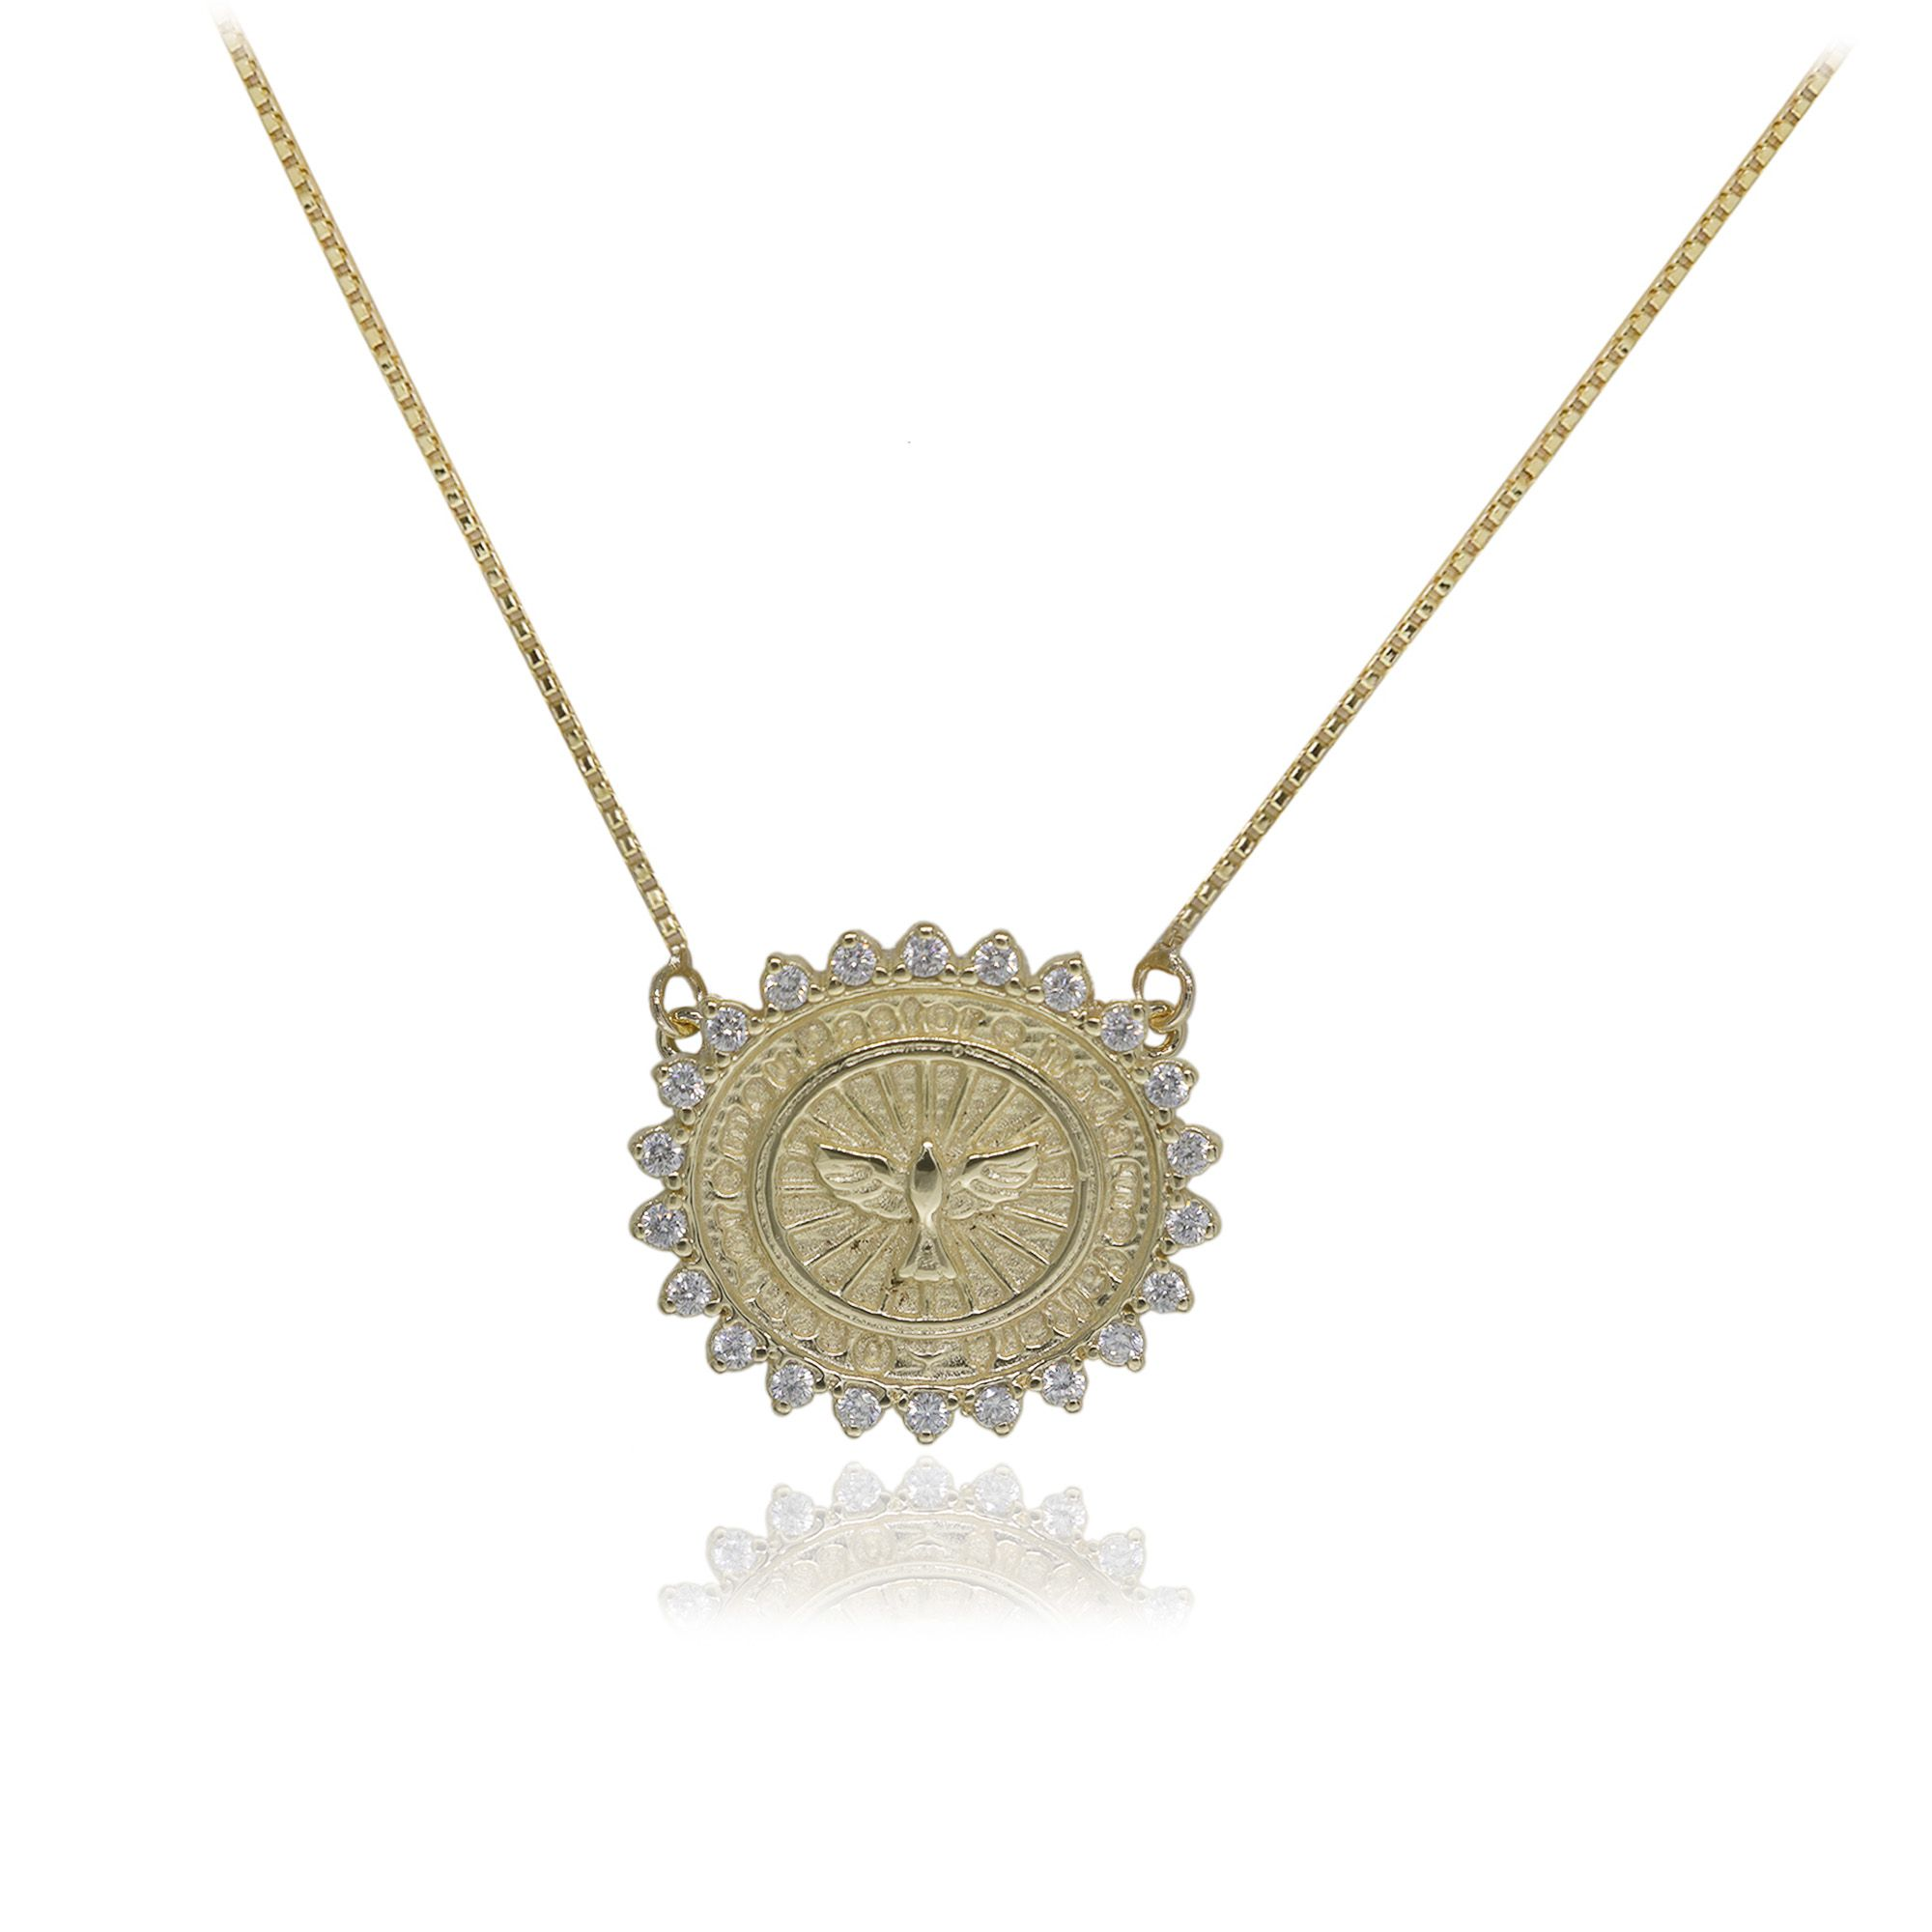 Colar Semi joia Mandala Espirito Santo folheado a ouro  18k ou rhodium